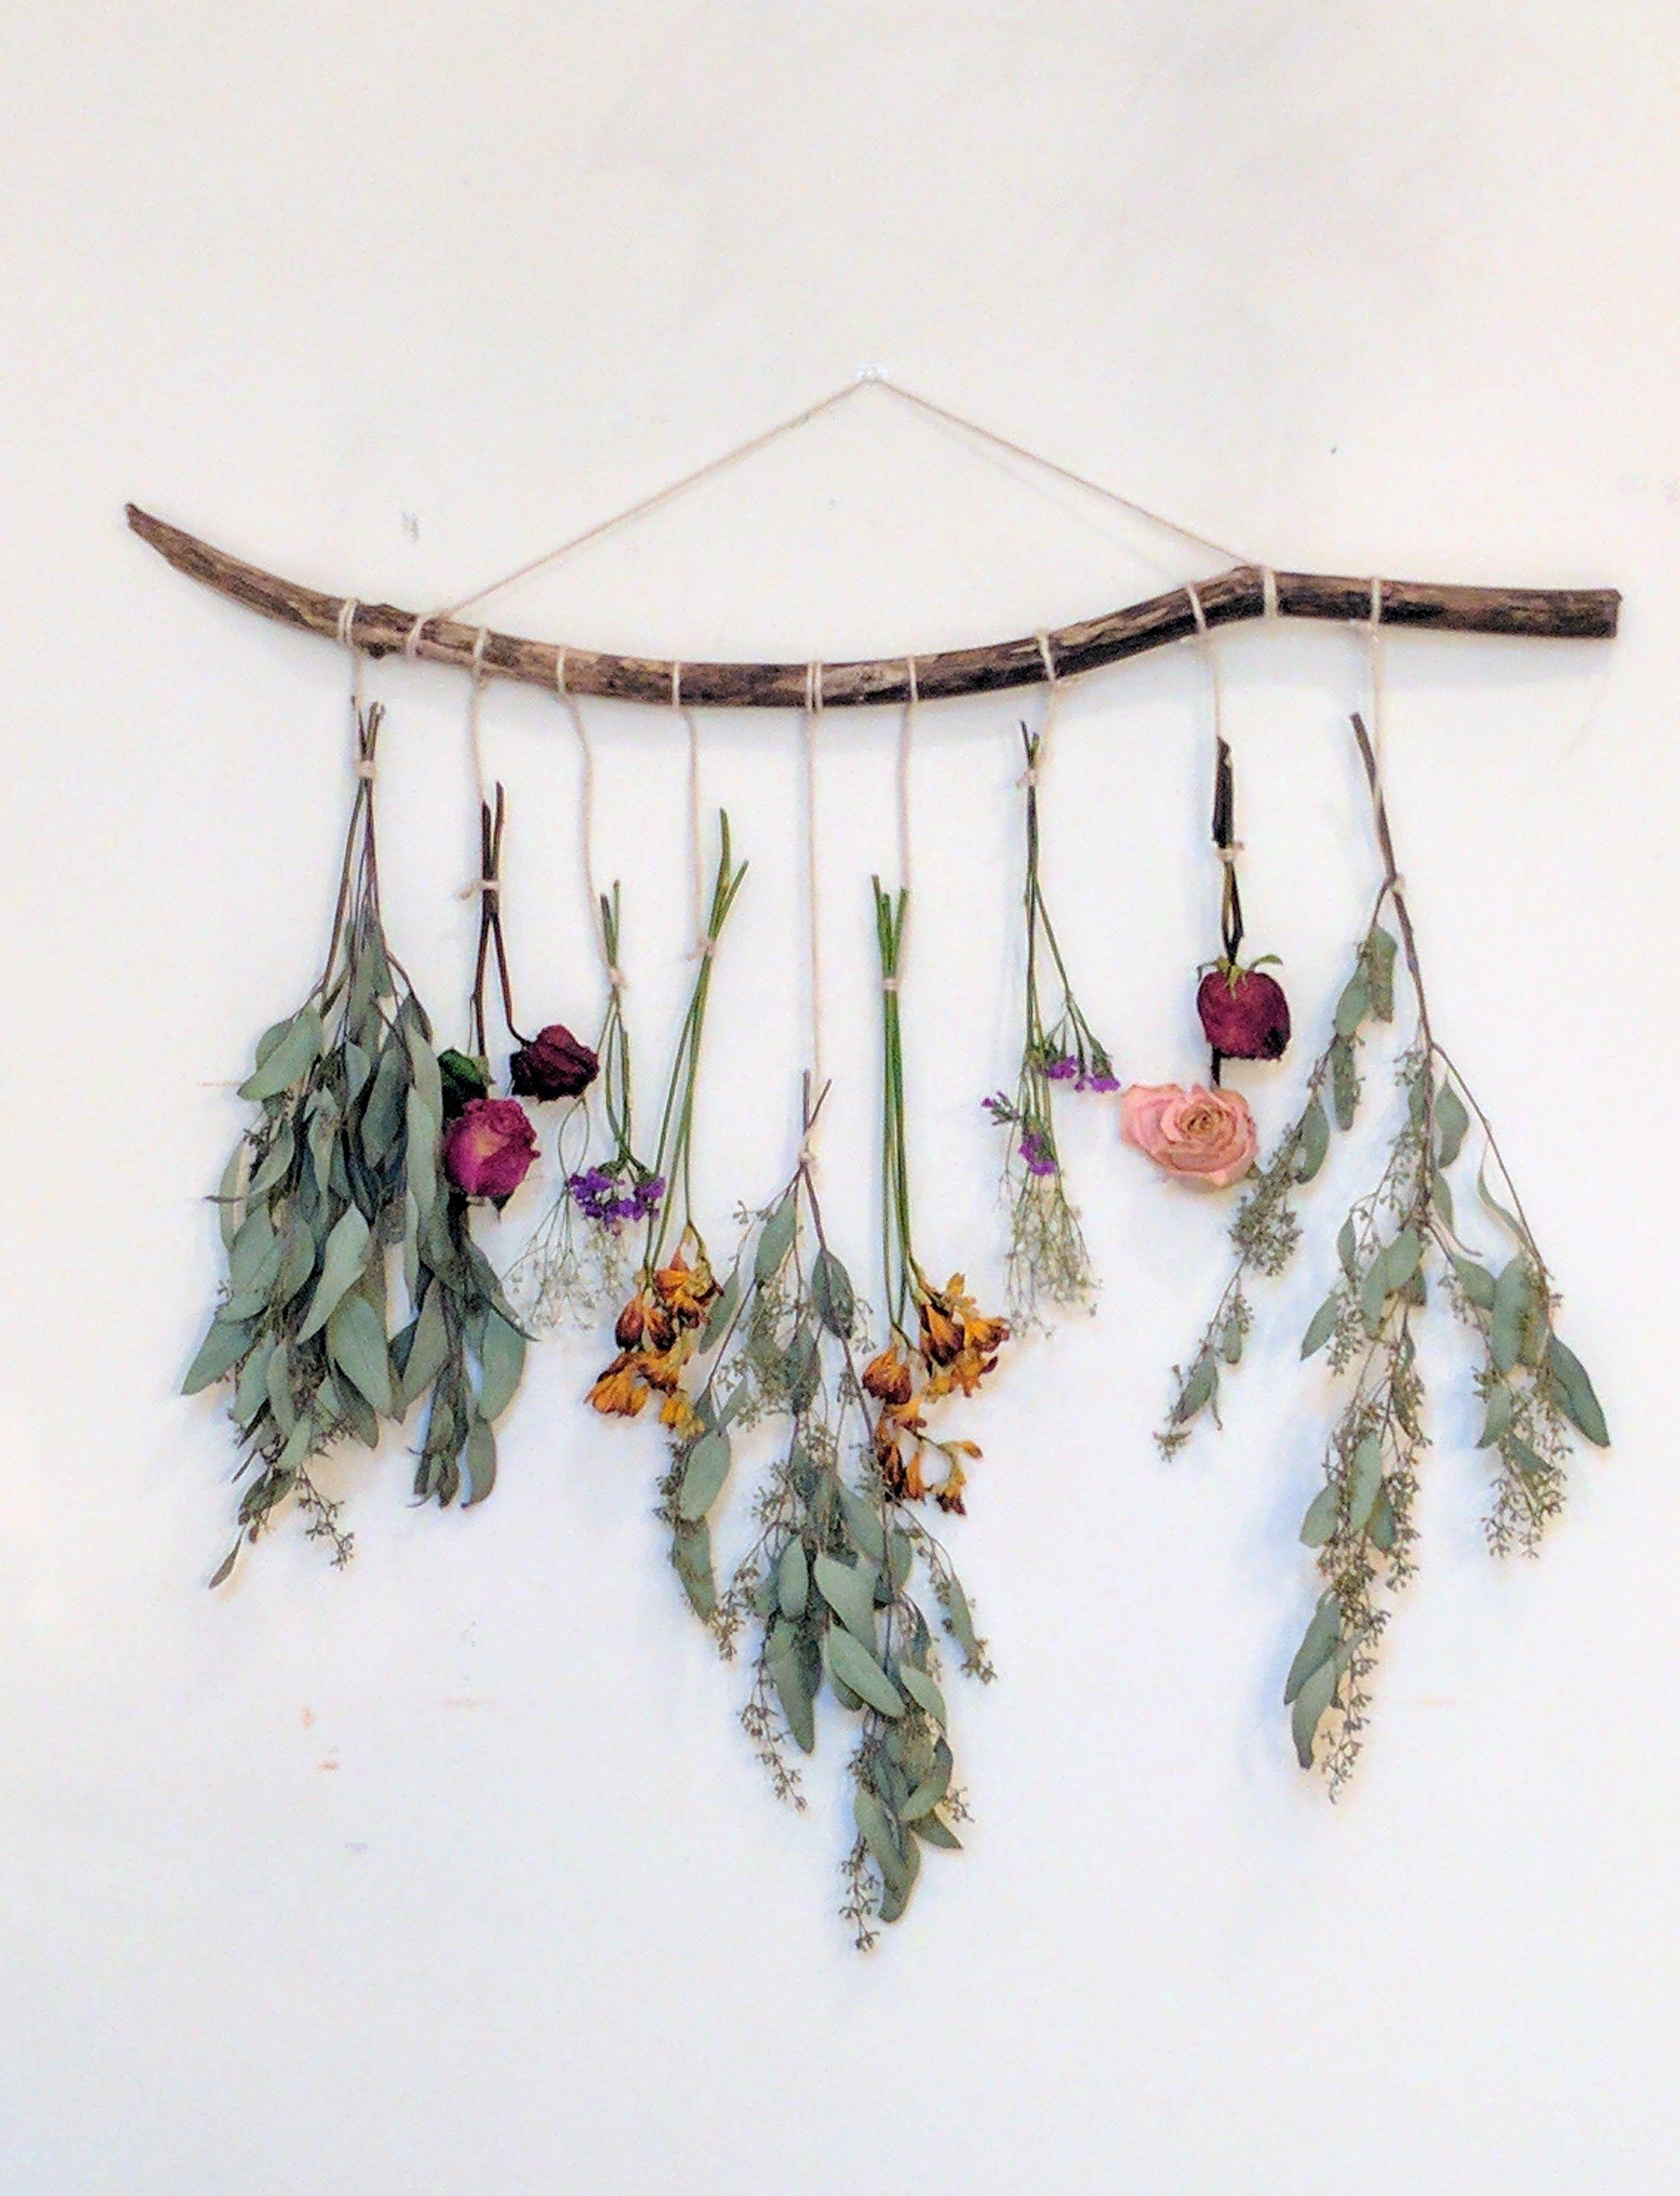 Dried Floral Wall Hanging Diy Blumen Wand Diy Wandbehang Gestalten